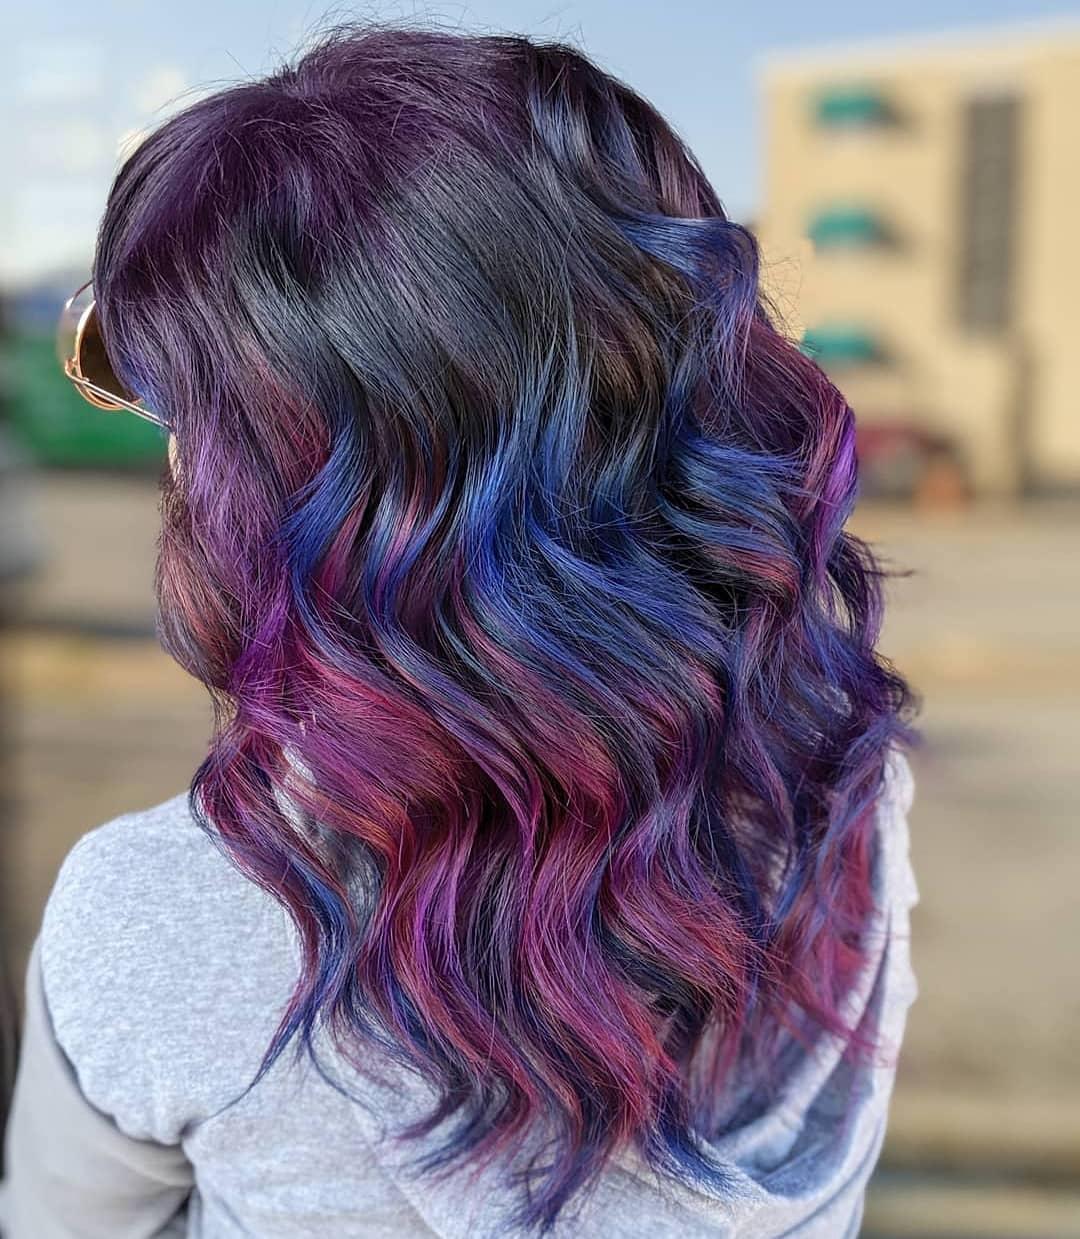 Oil Slick hairstyles ideas